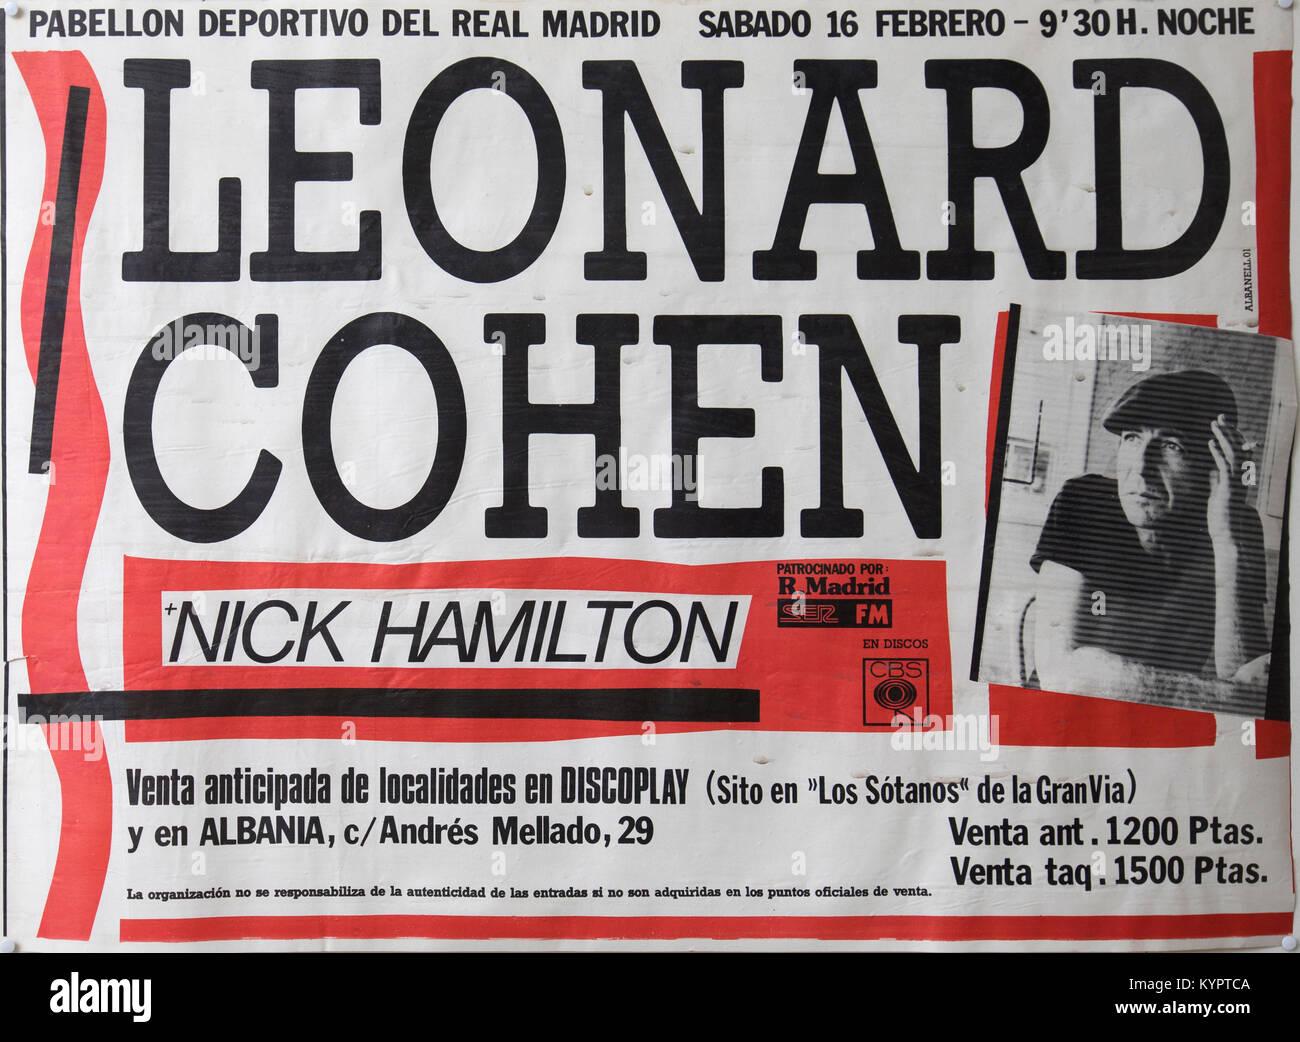 https www alamy com stock photo leonard cohen plus nick hamilton madrid musical concert poster 171991130 html